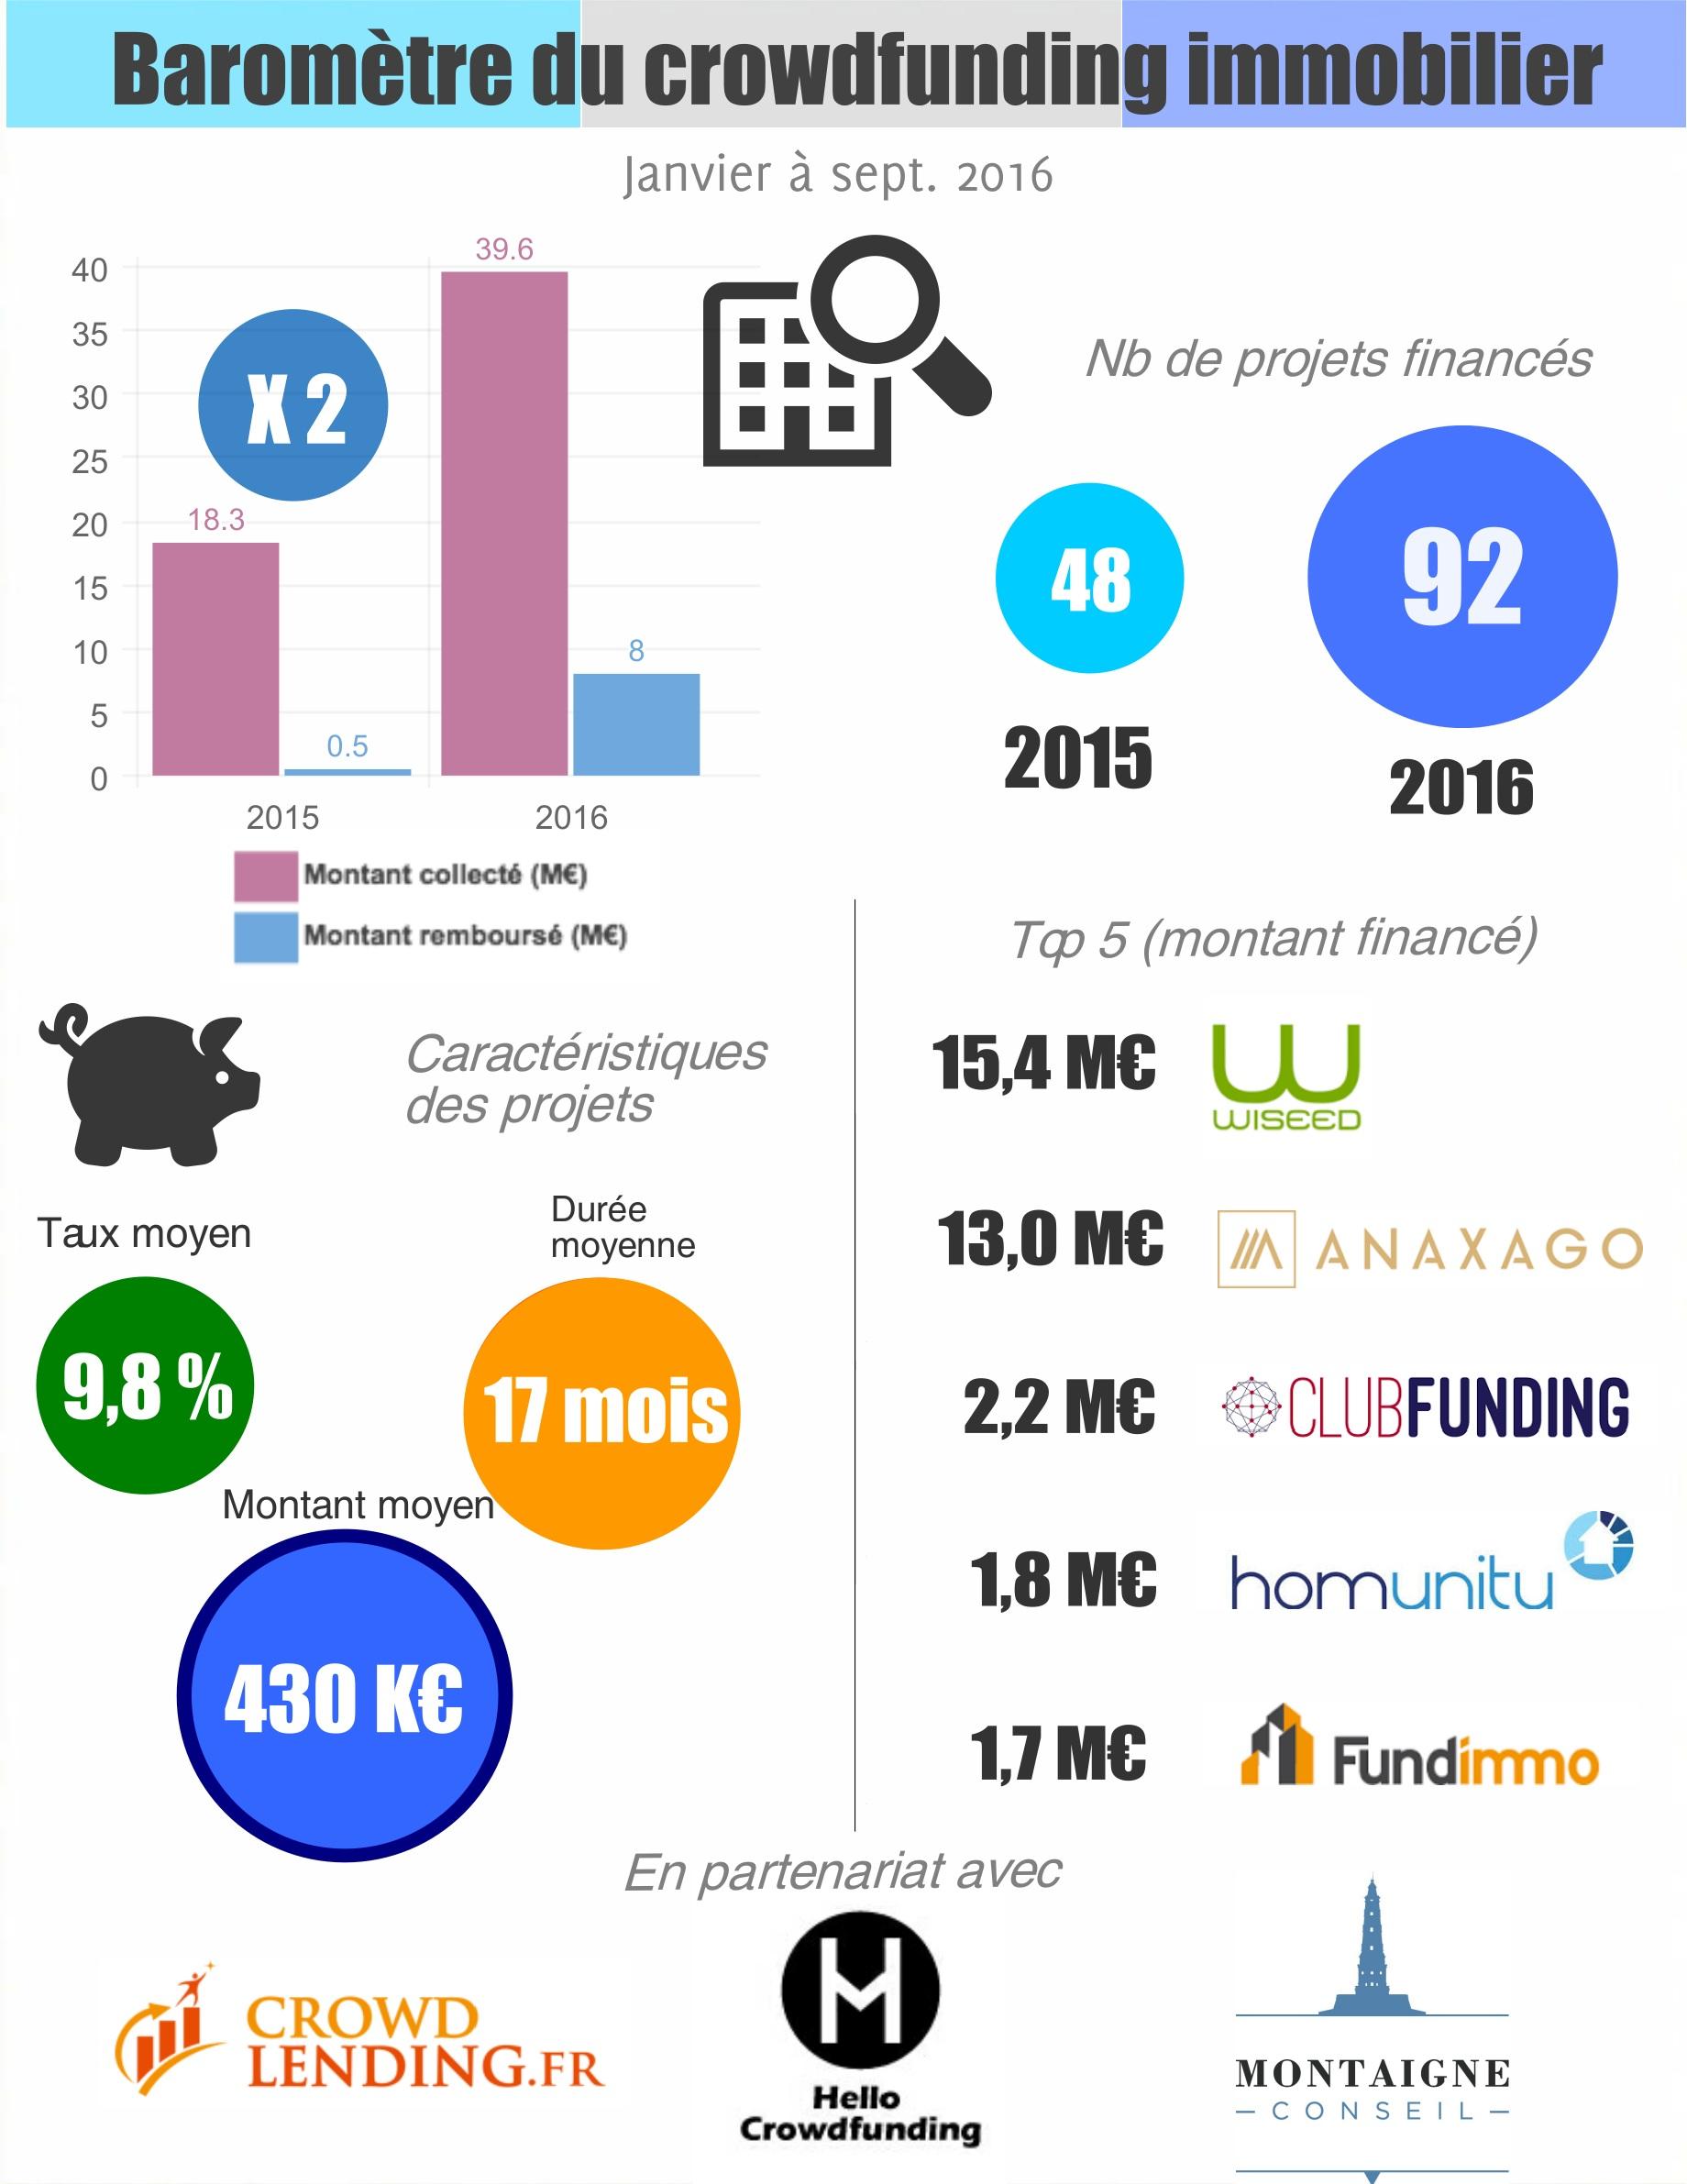 Chiffres du crowdfunding immobilier - septembre 2016